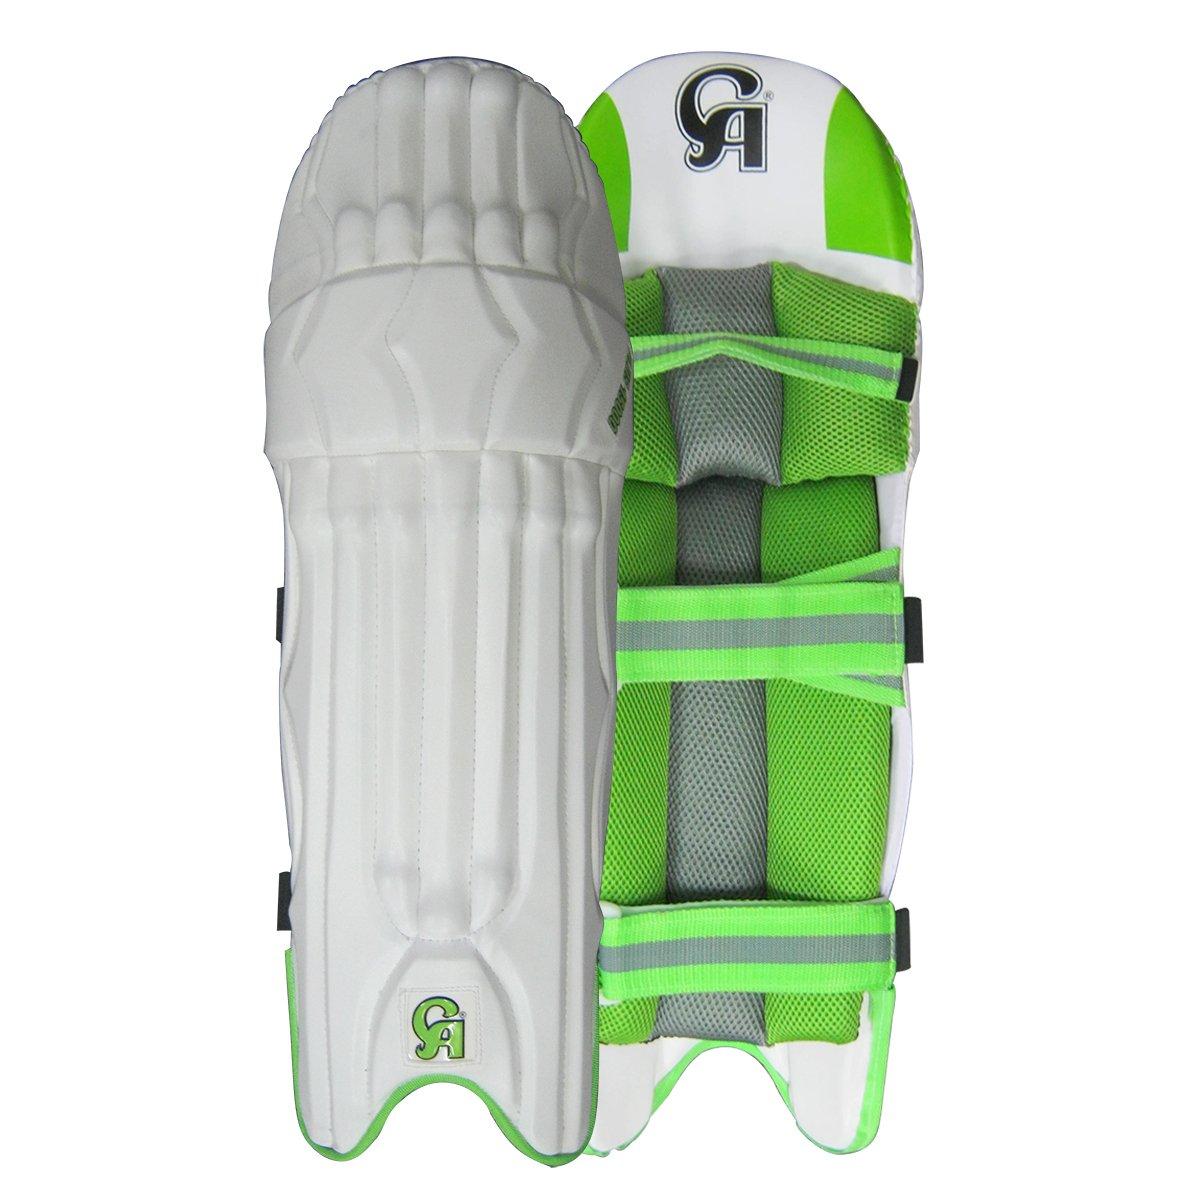 CA Plus 12000 Batting Pad made of EVA foam especially crafted for International Players.